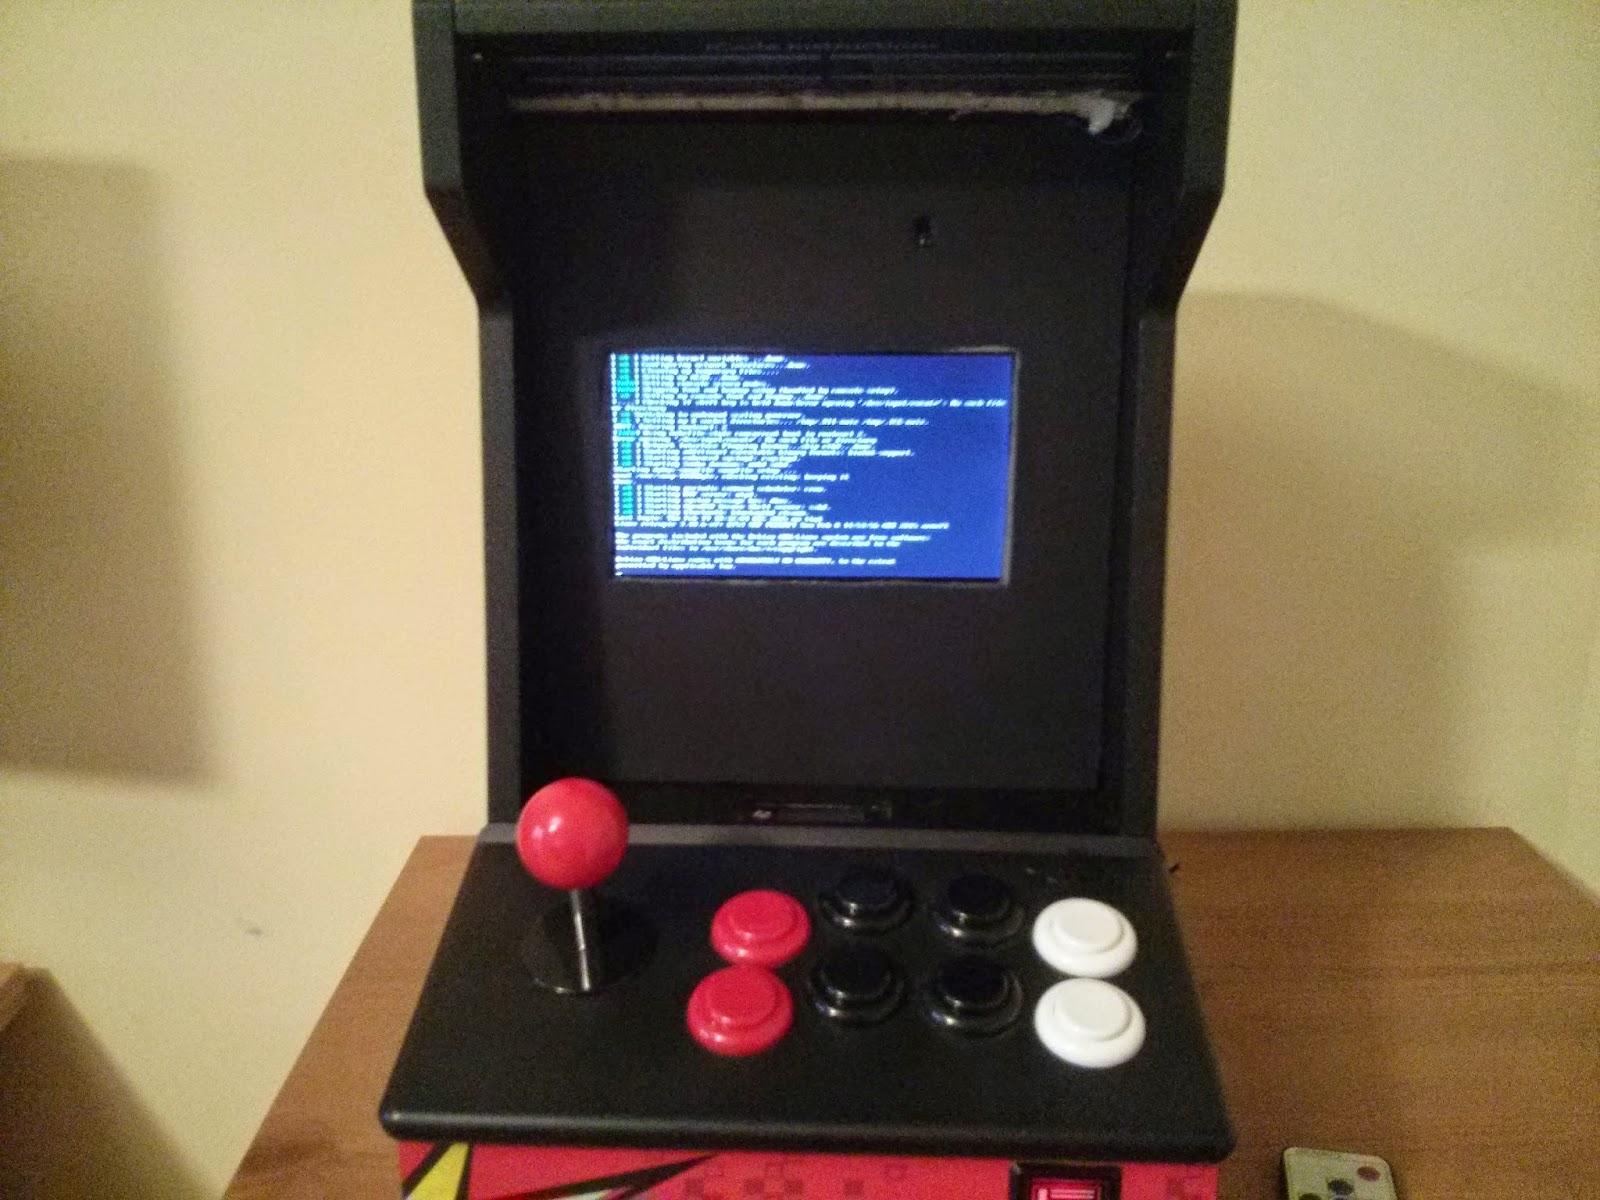 Build A Cheap Arcade Cabinet With A Raspberry Pi 2 u0026 RetroPie - BEZEL UPDATE & Man Cave Modder: Build A Cheap Arcade Cabinet With A Raspberry Pi 2 ...